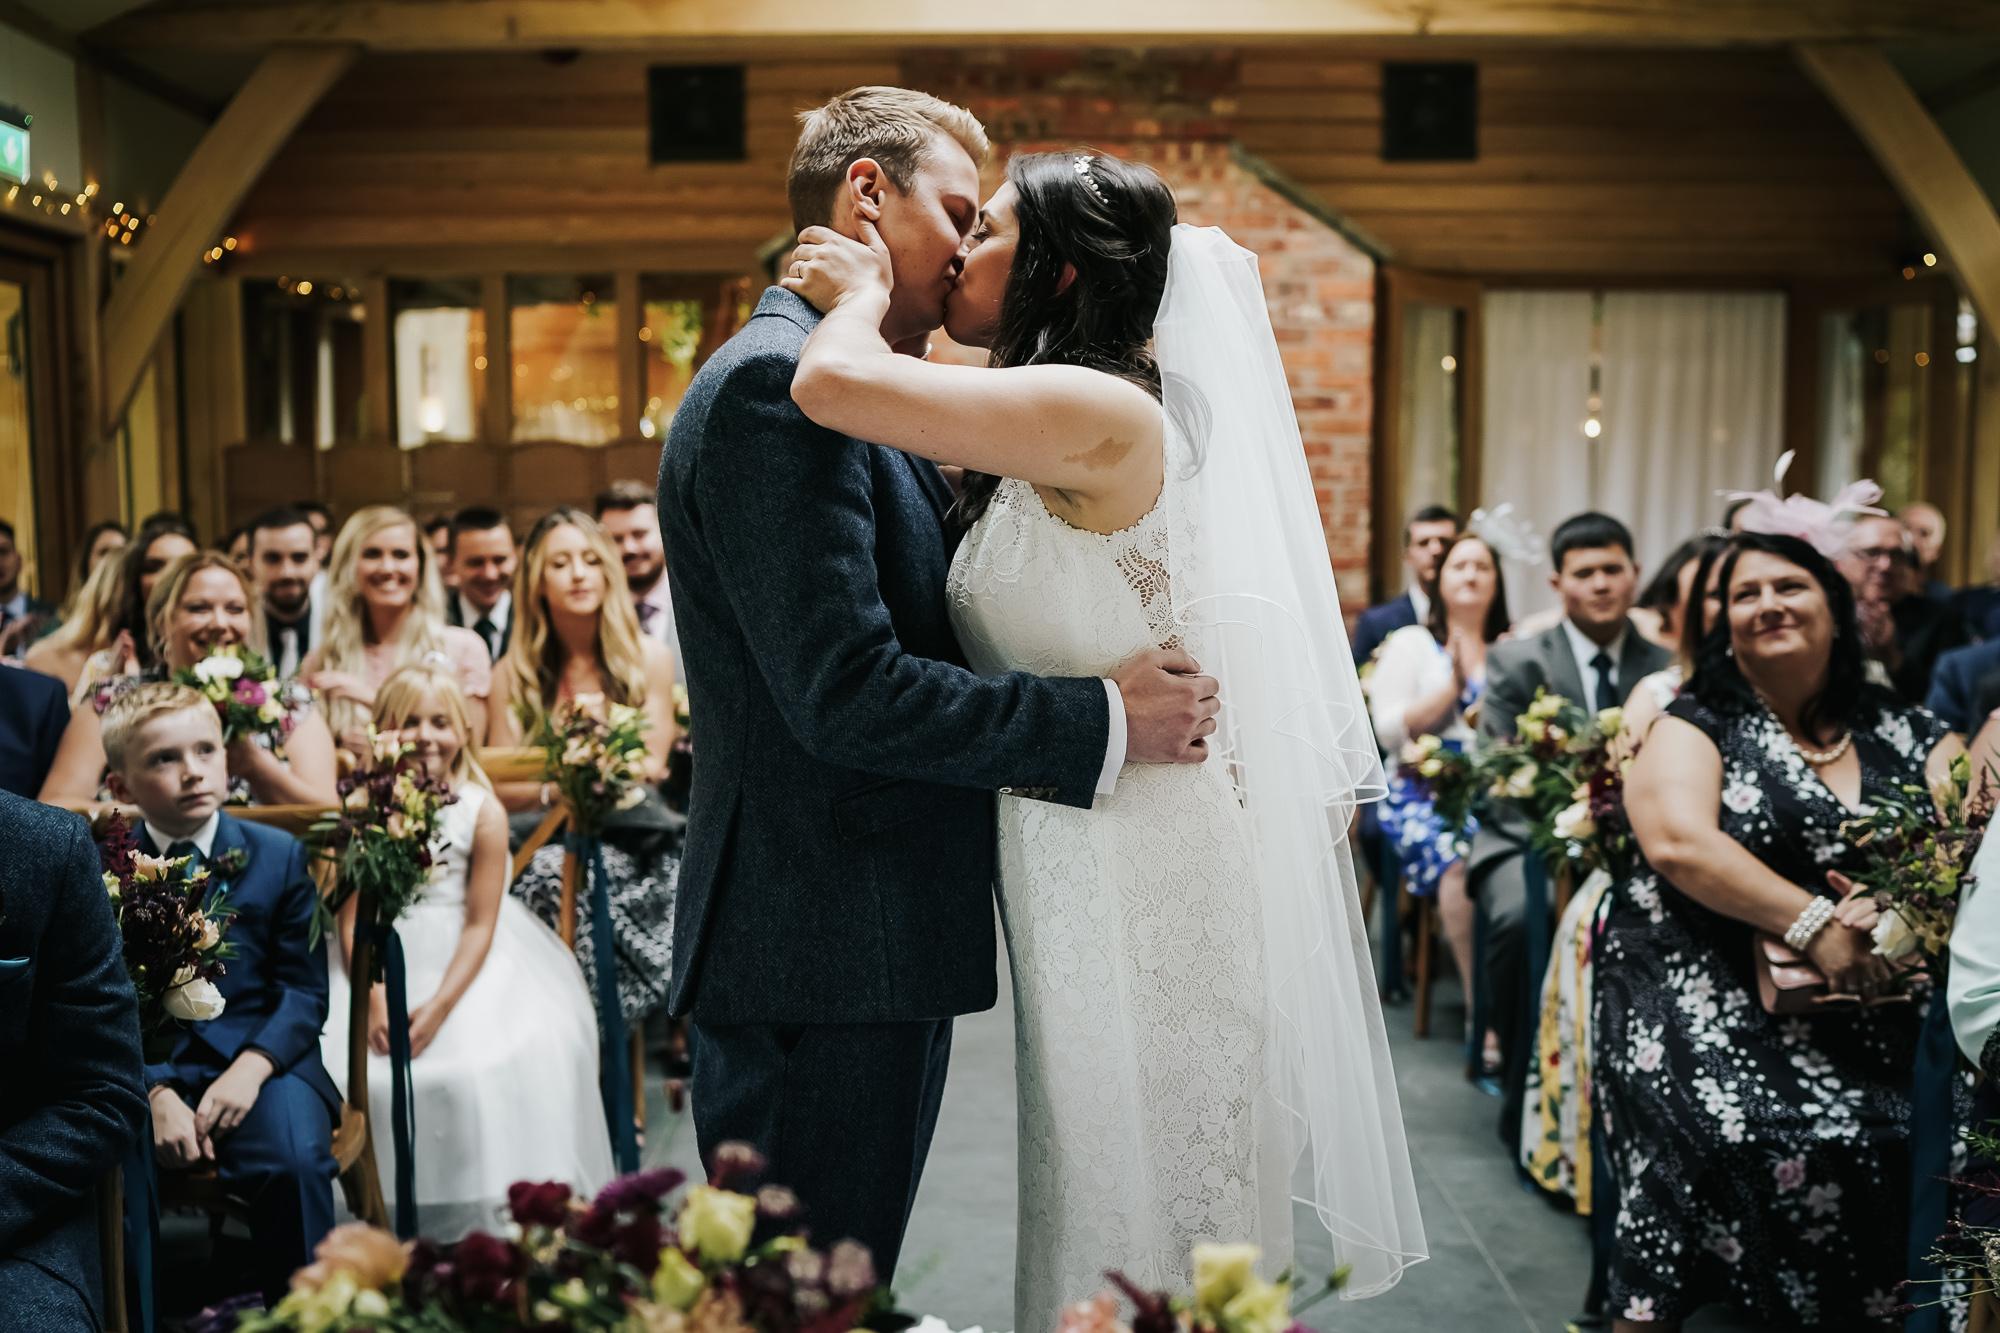 Oak tree of peover wedding photography cheshire wedding photographer (20 of 56).jpg